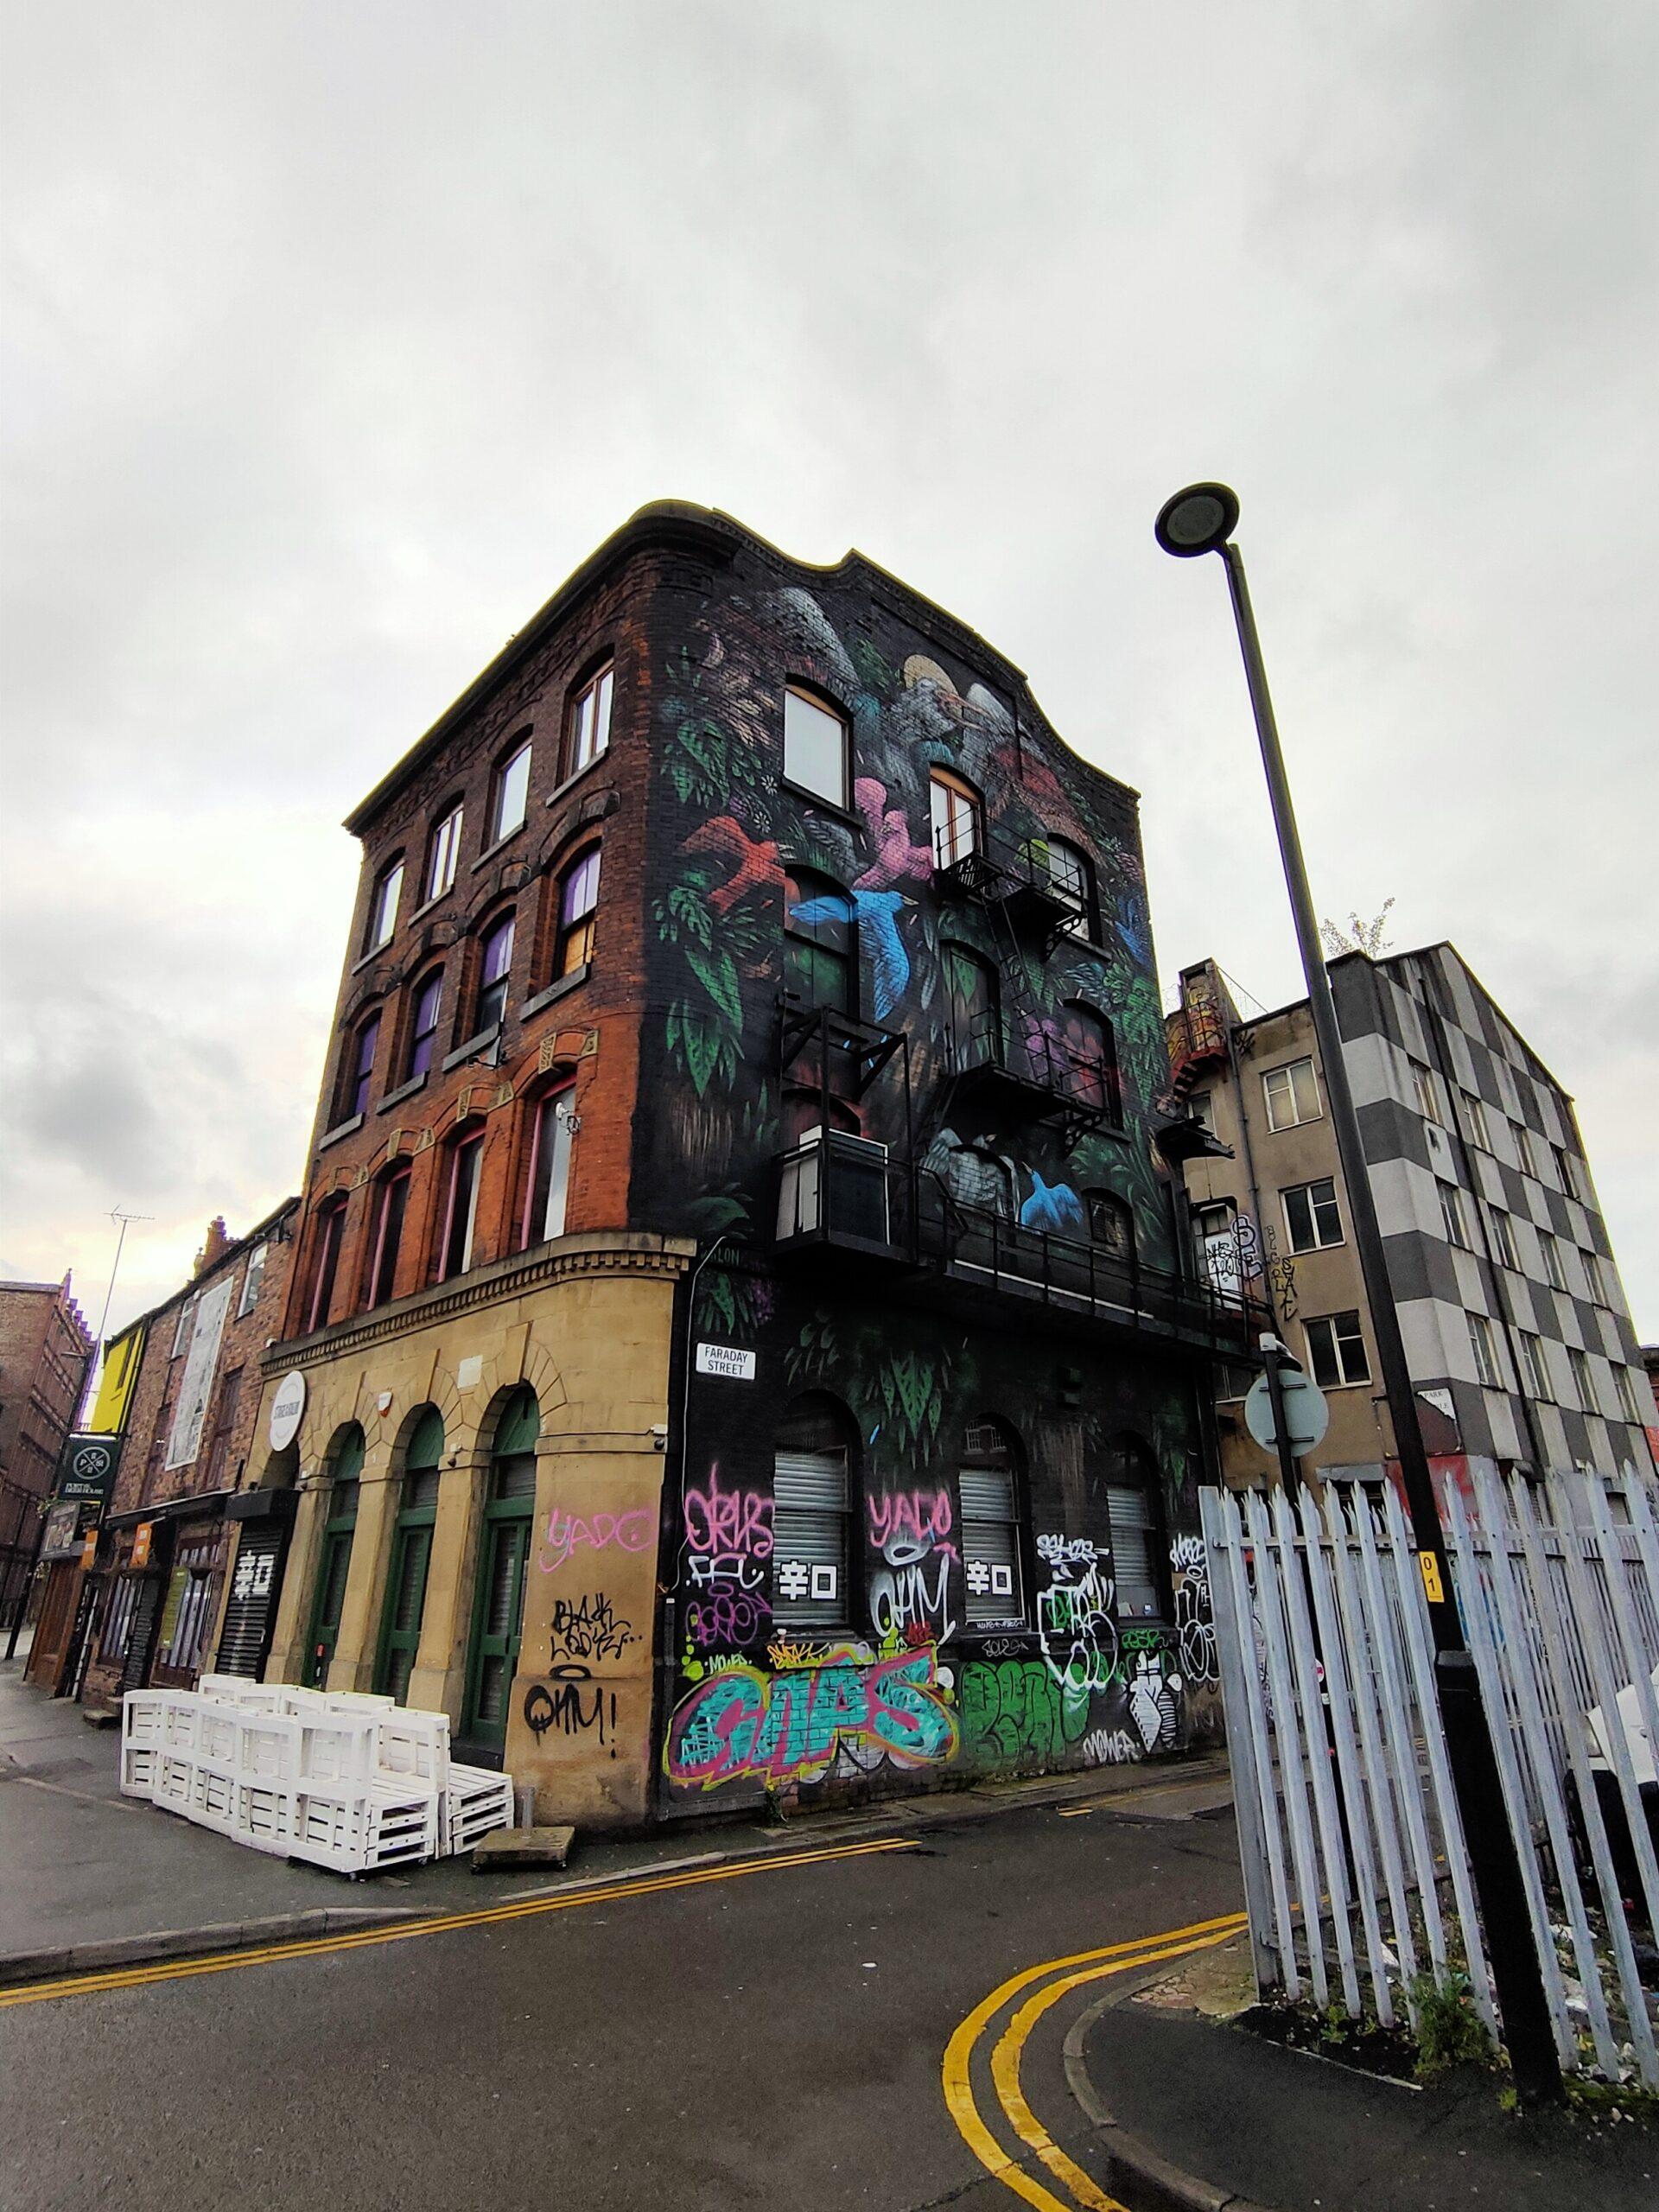 Birds Mural, Faraday Street, Manchester